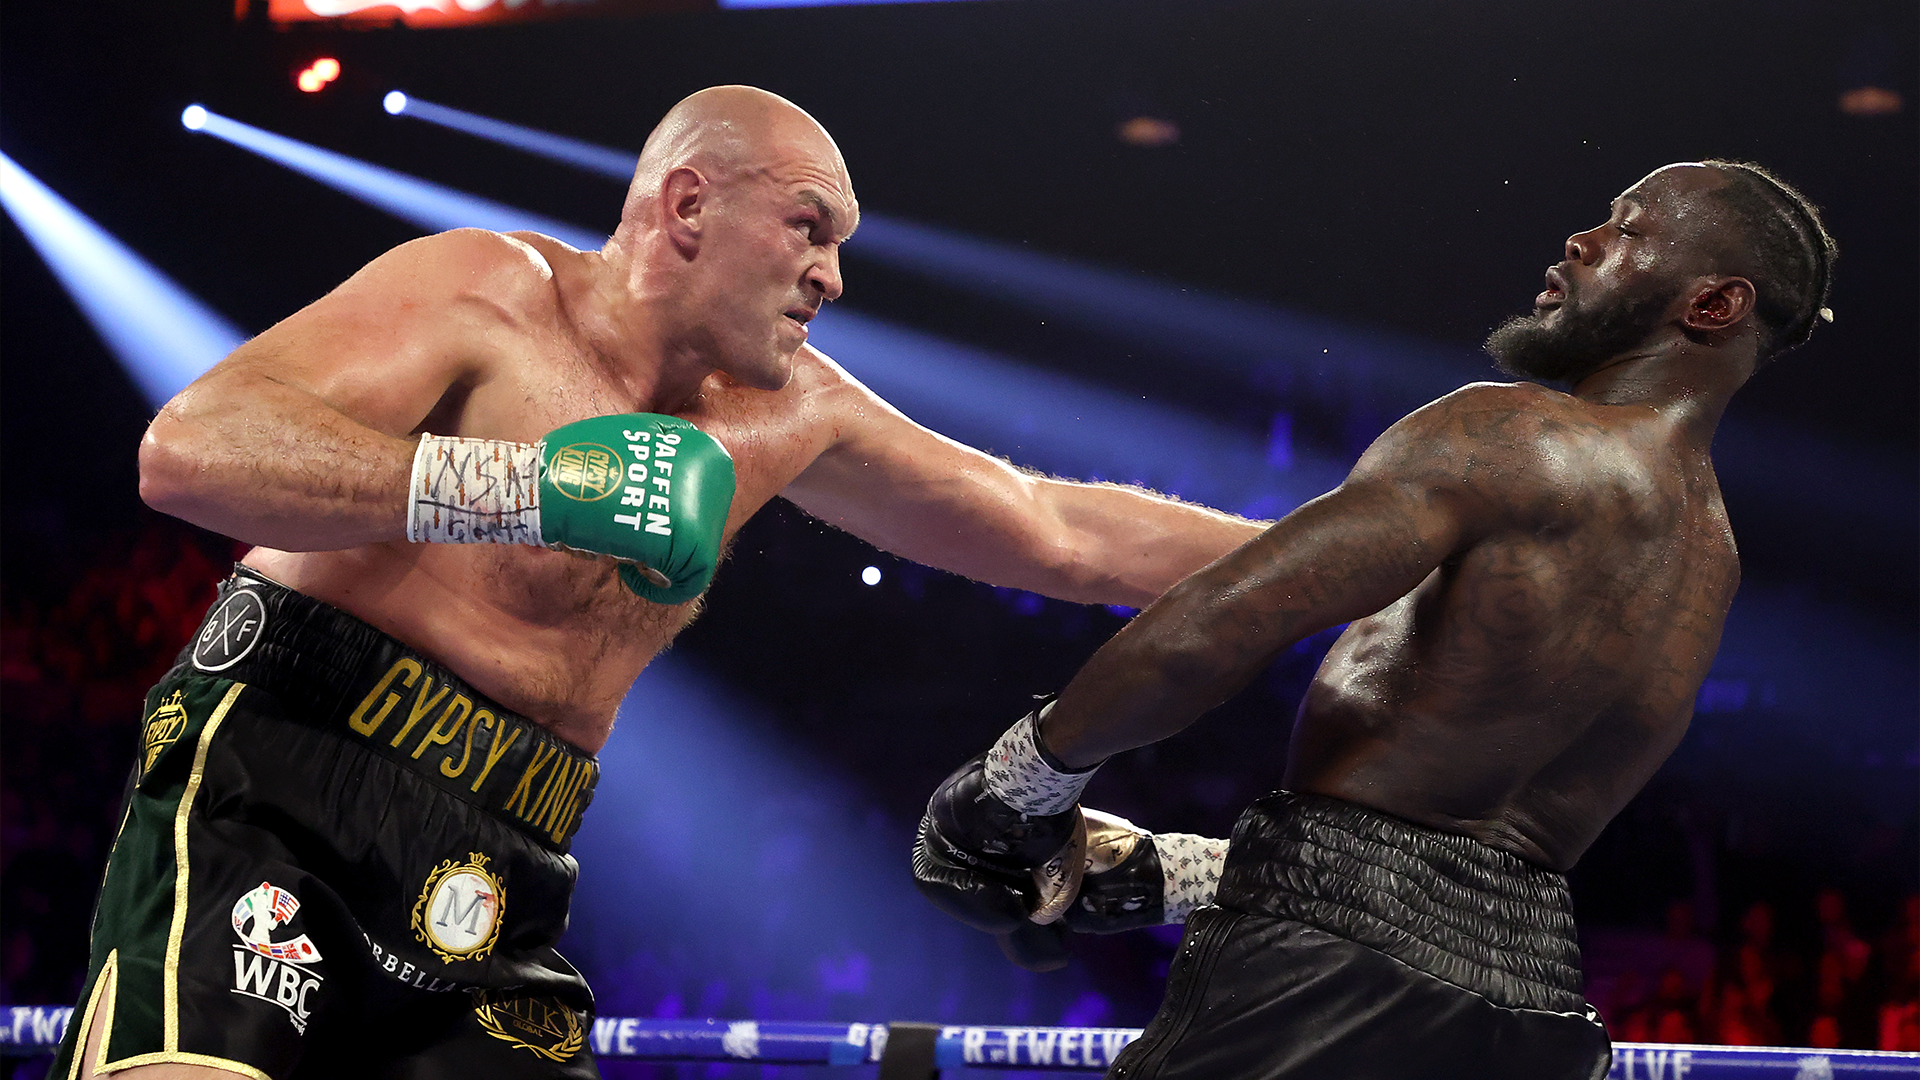 Tyson Fury vs Deontay Wilder 2: Tyson Fury secures emphatic ...